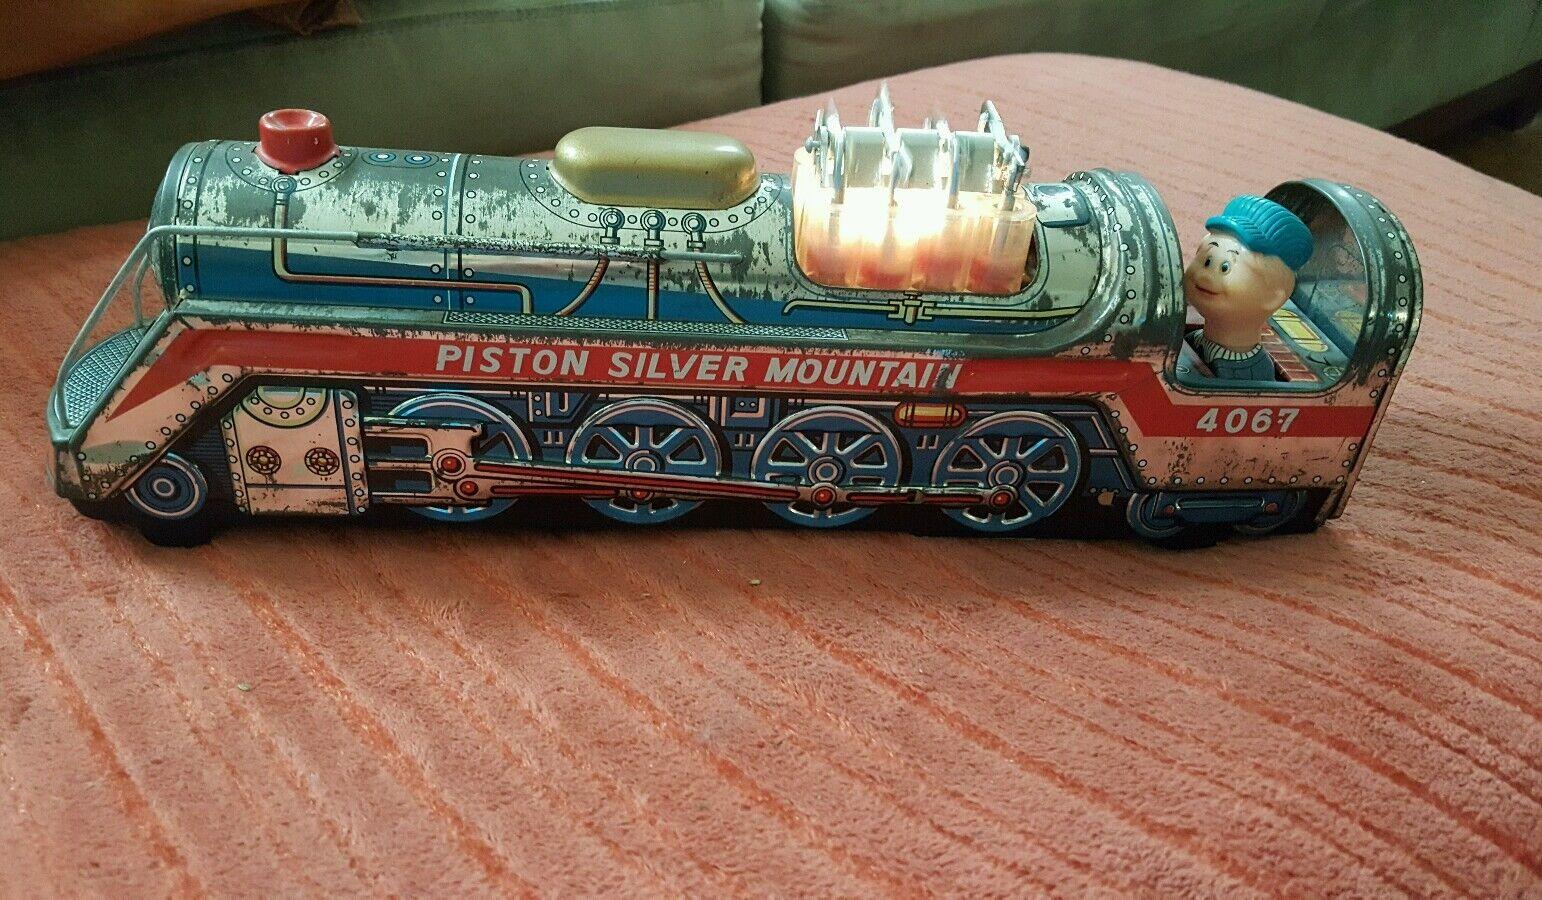 Rara De colección con batería de Plata del Pistón Motor De Tren De Montaña 4067 Funciona